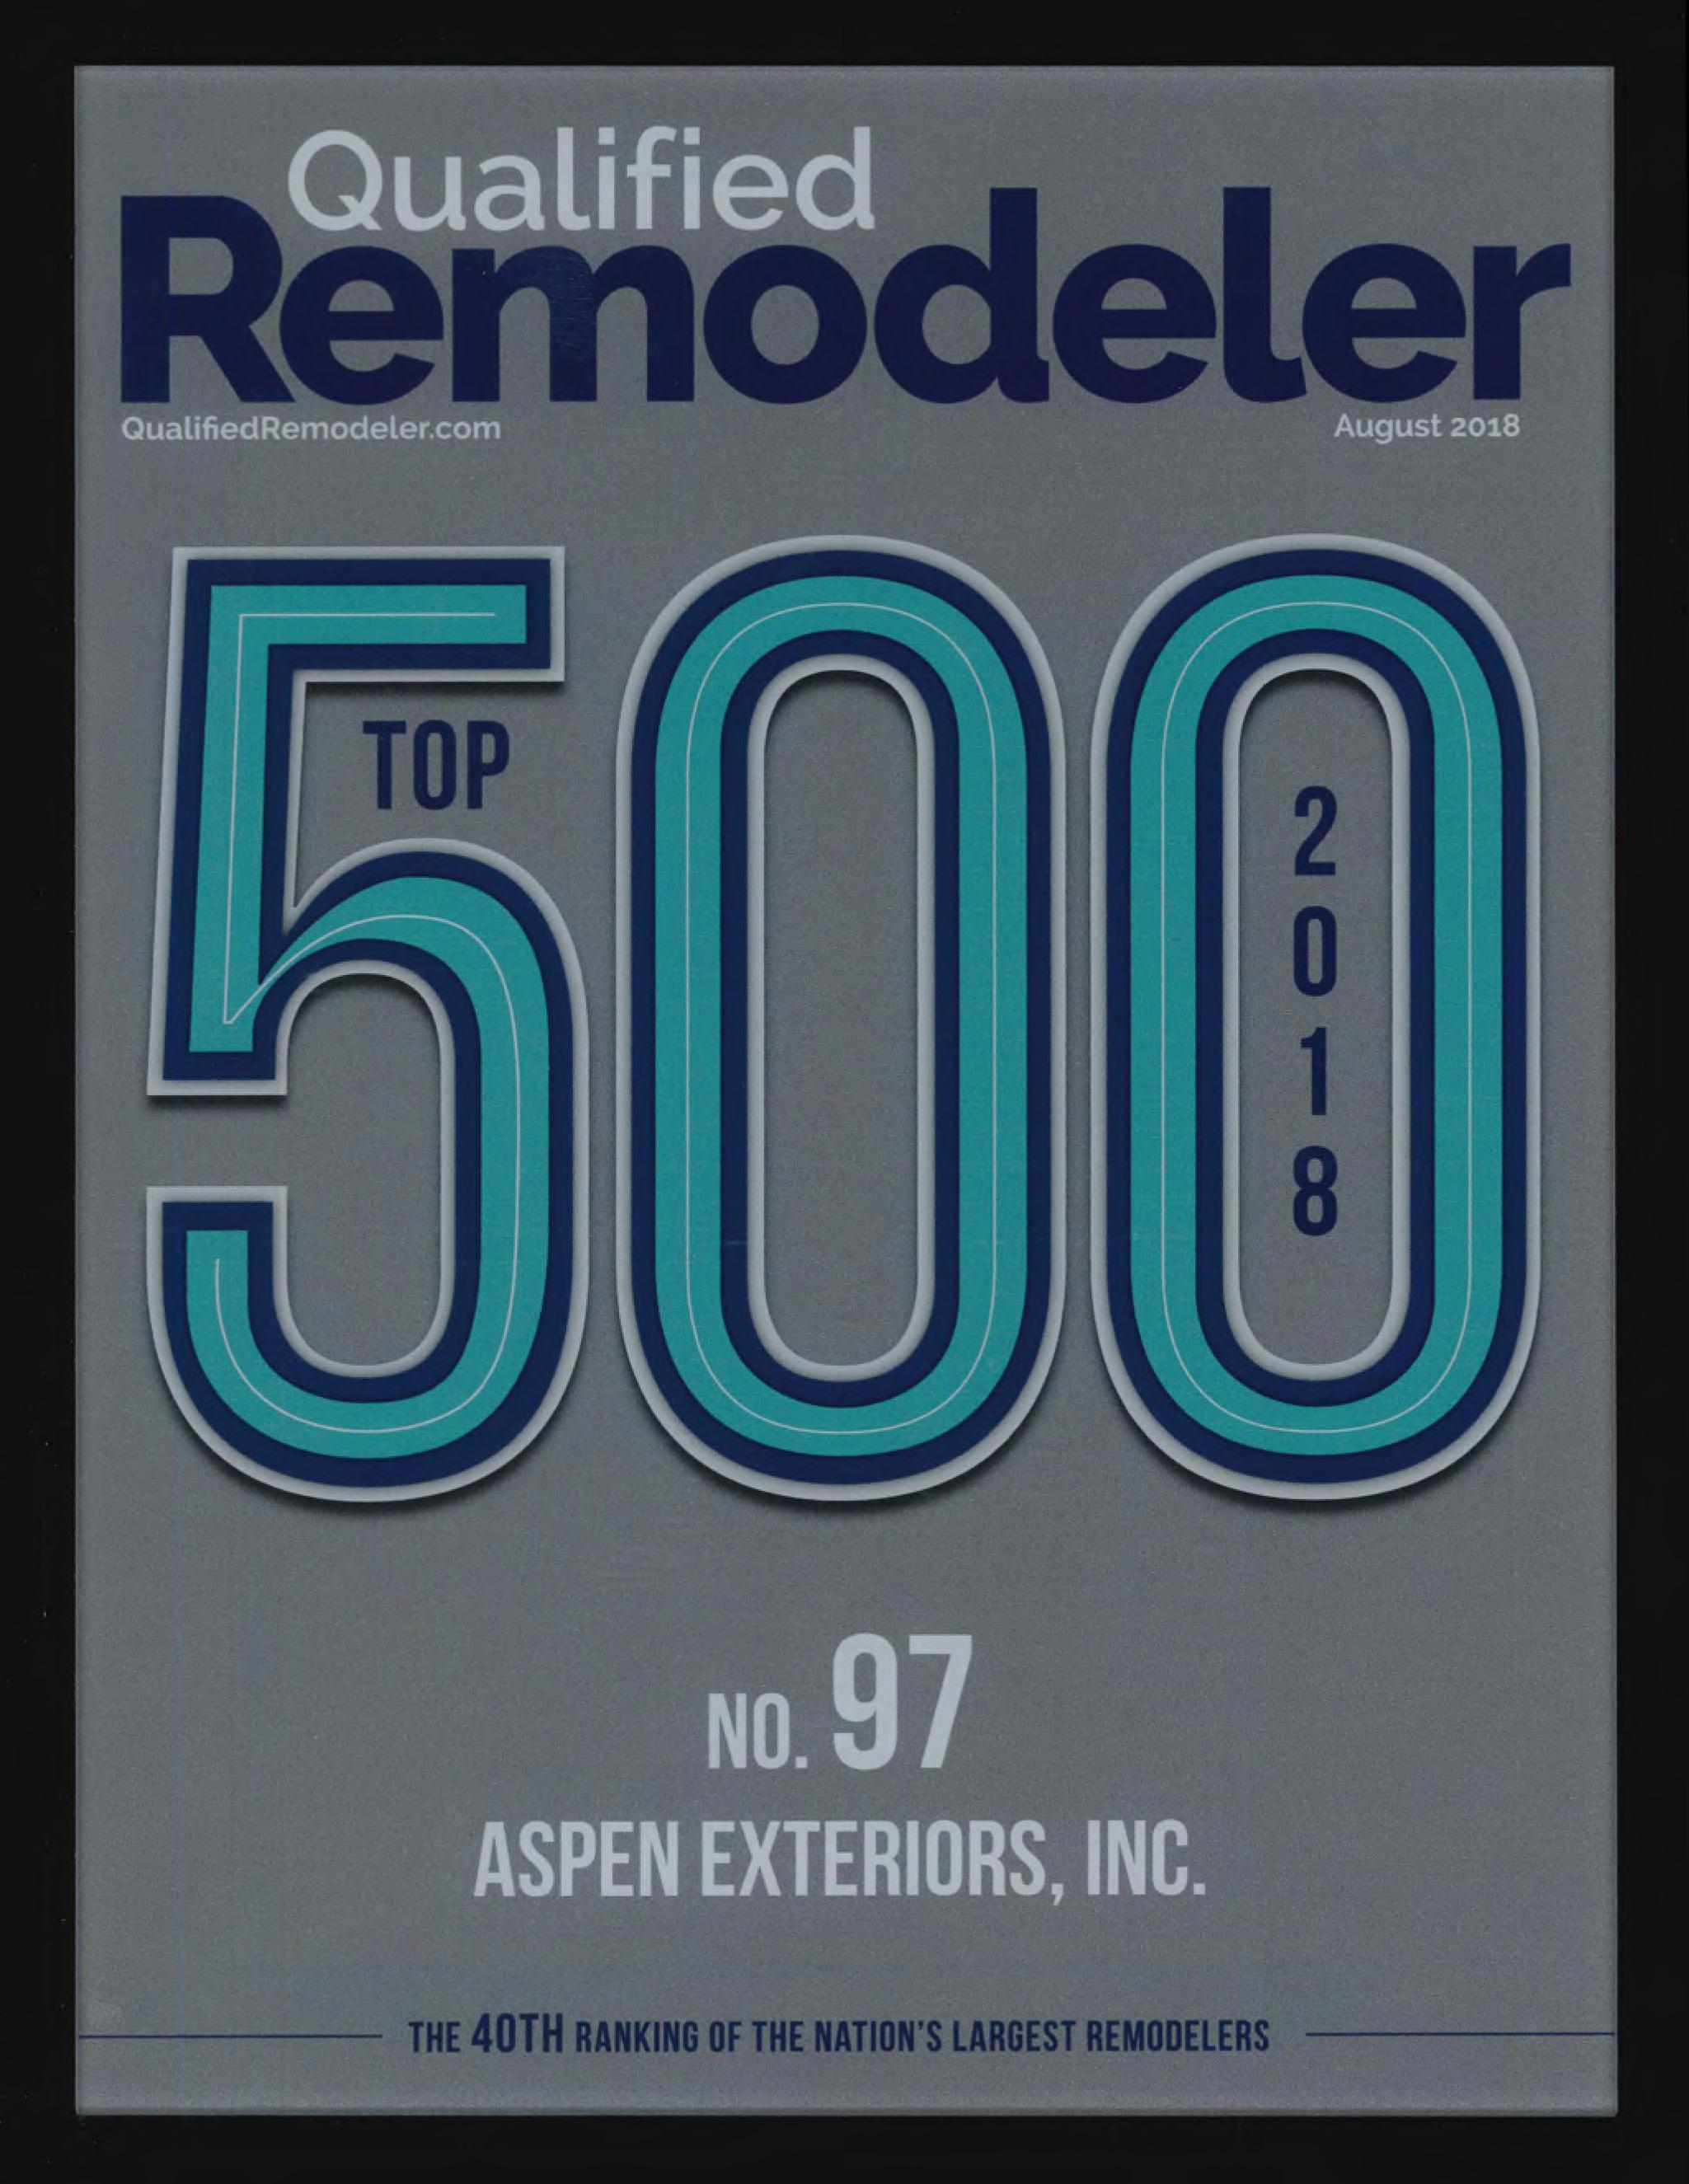 Qualified Remodeler: Top 500